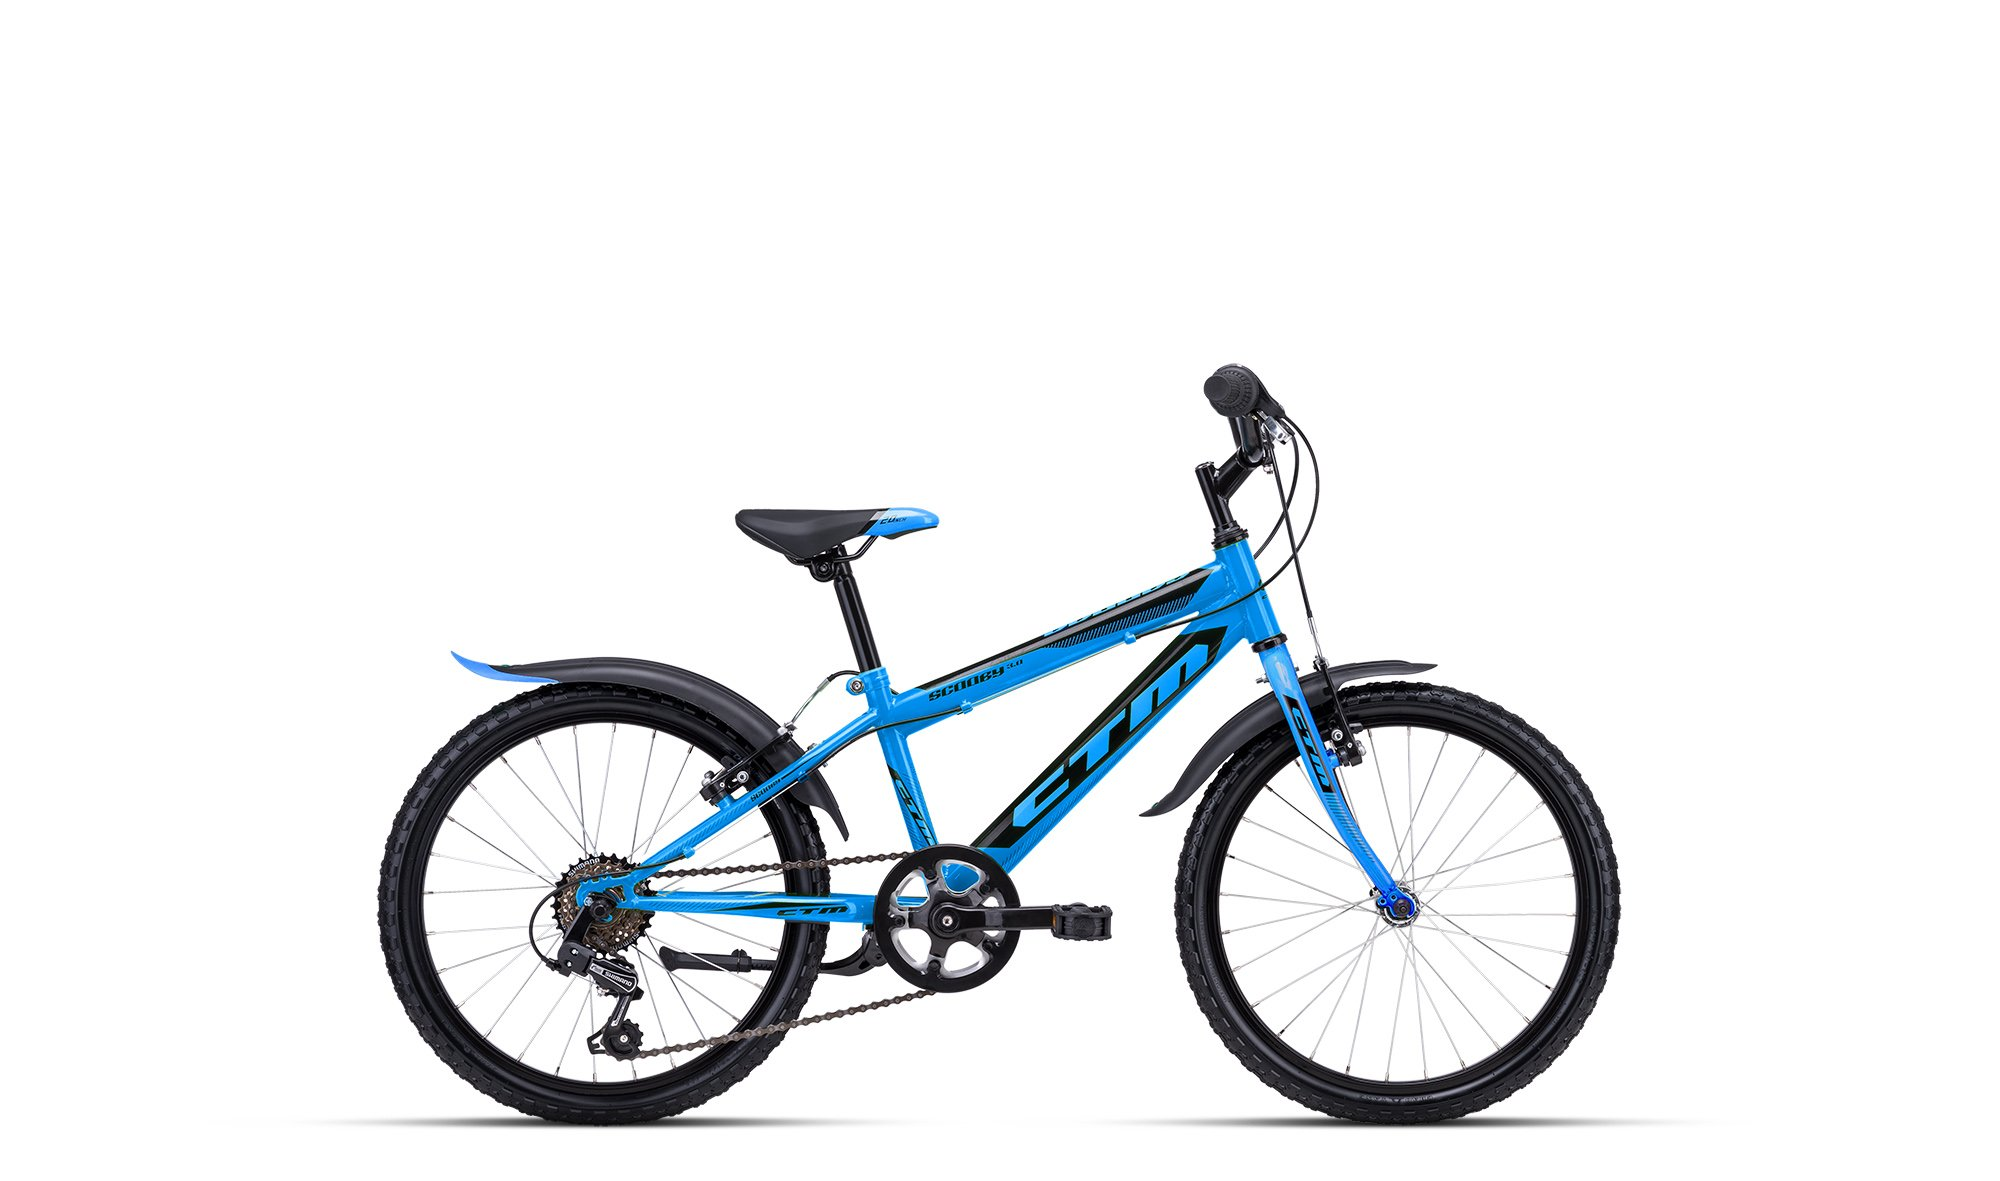 Bērnu divritenis velosipēds CTM Scooby 2.0 20 collas